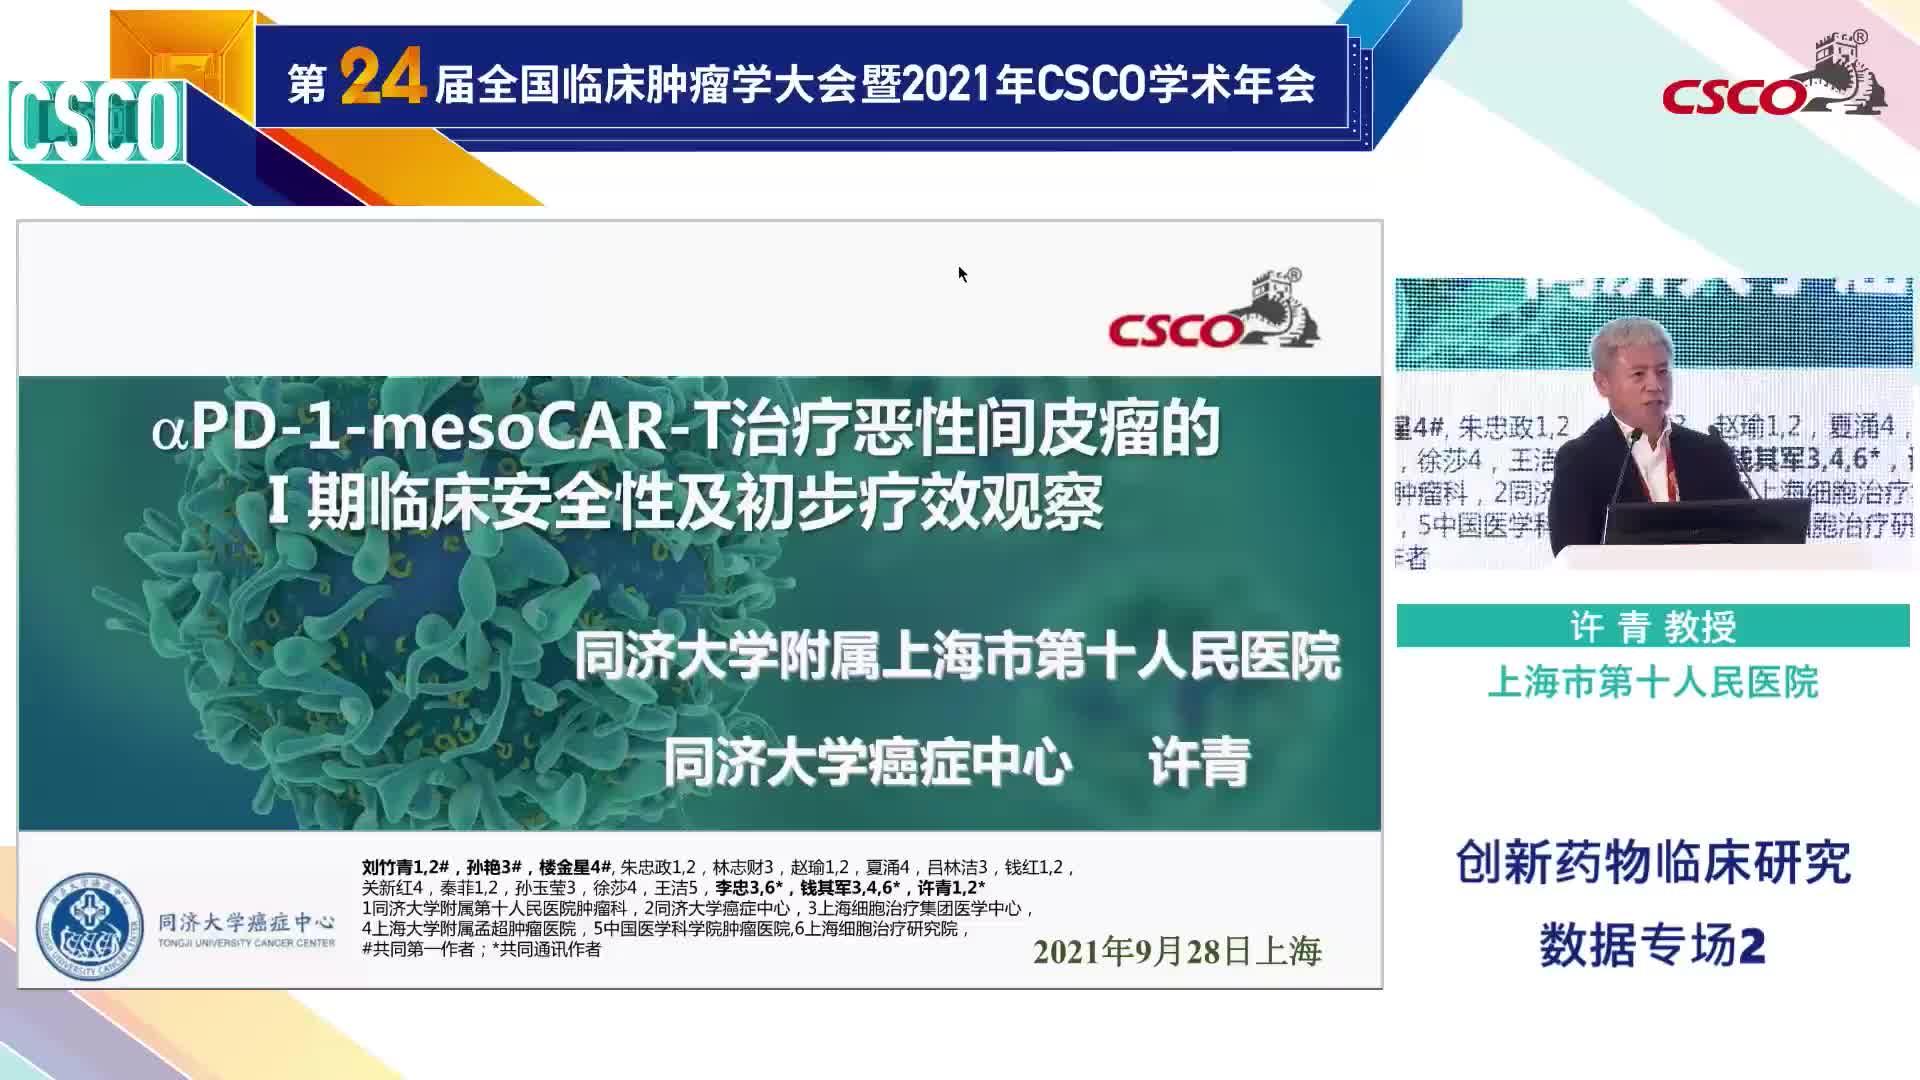 aPD-1-mesoCAR-T细胞治疗恶性间皮瘤的I期临床安全性和疗效观察